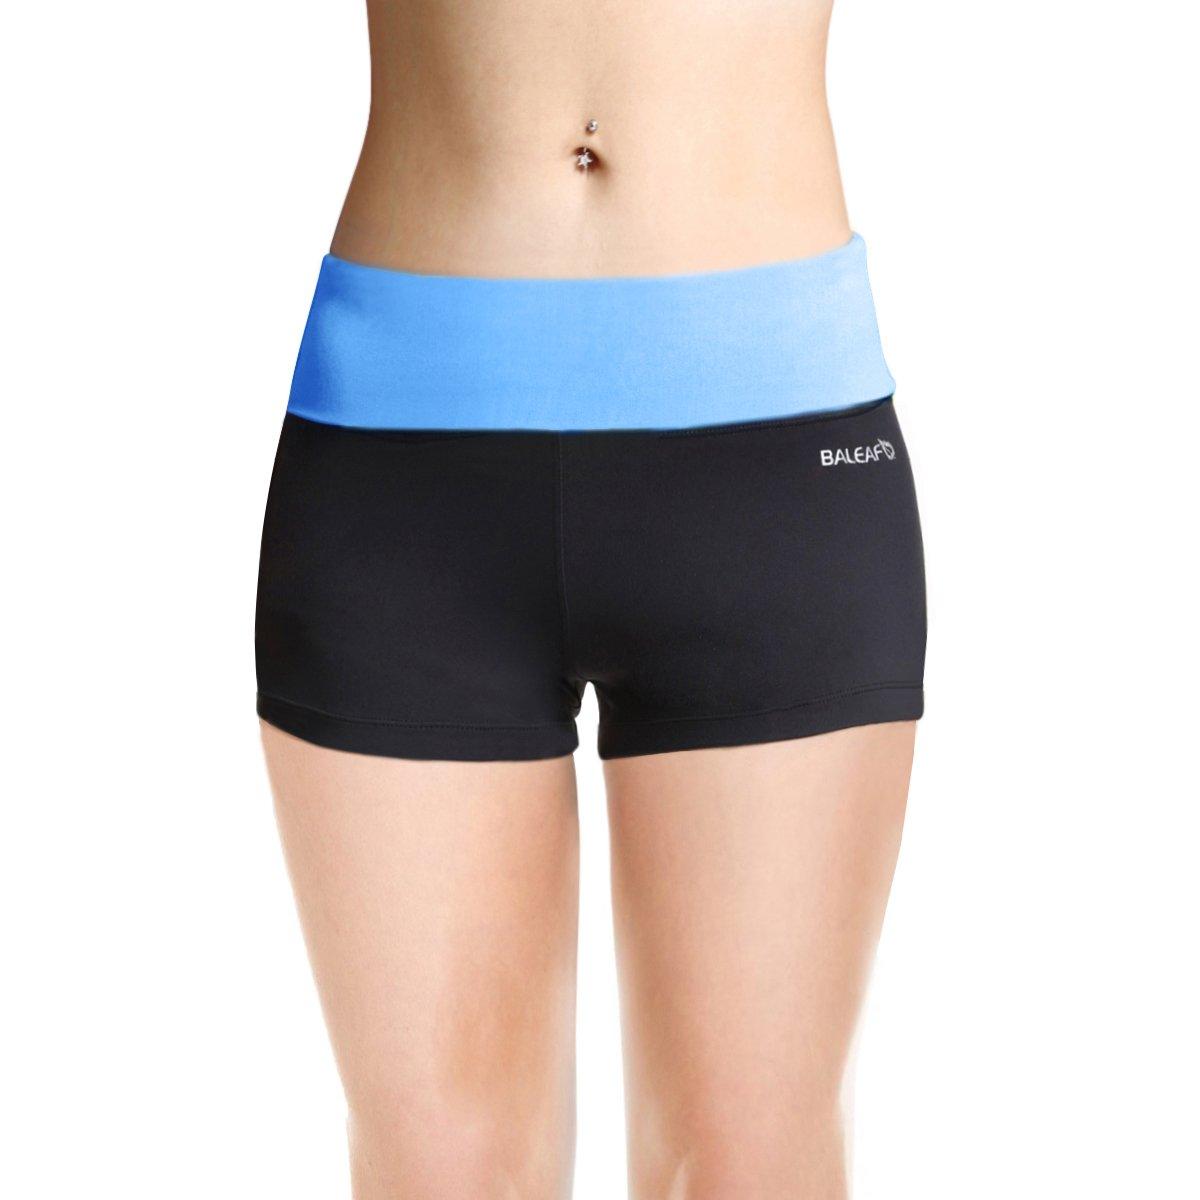 BALEAF Women's High Waist Swim Yoga Volleyball Shorts Running Workout Tennis Athletic Shorts Inner Pocket Little Boy Blue Size XL